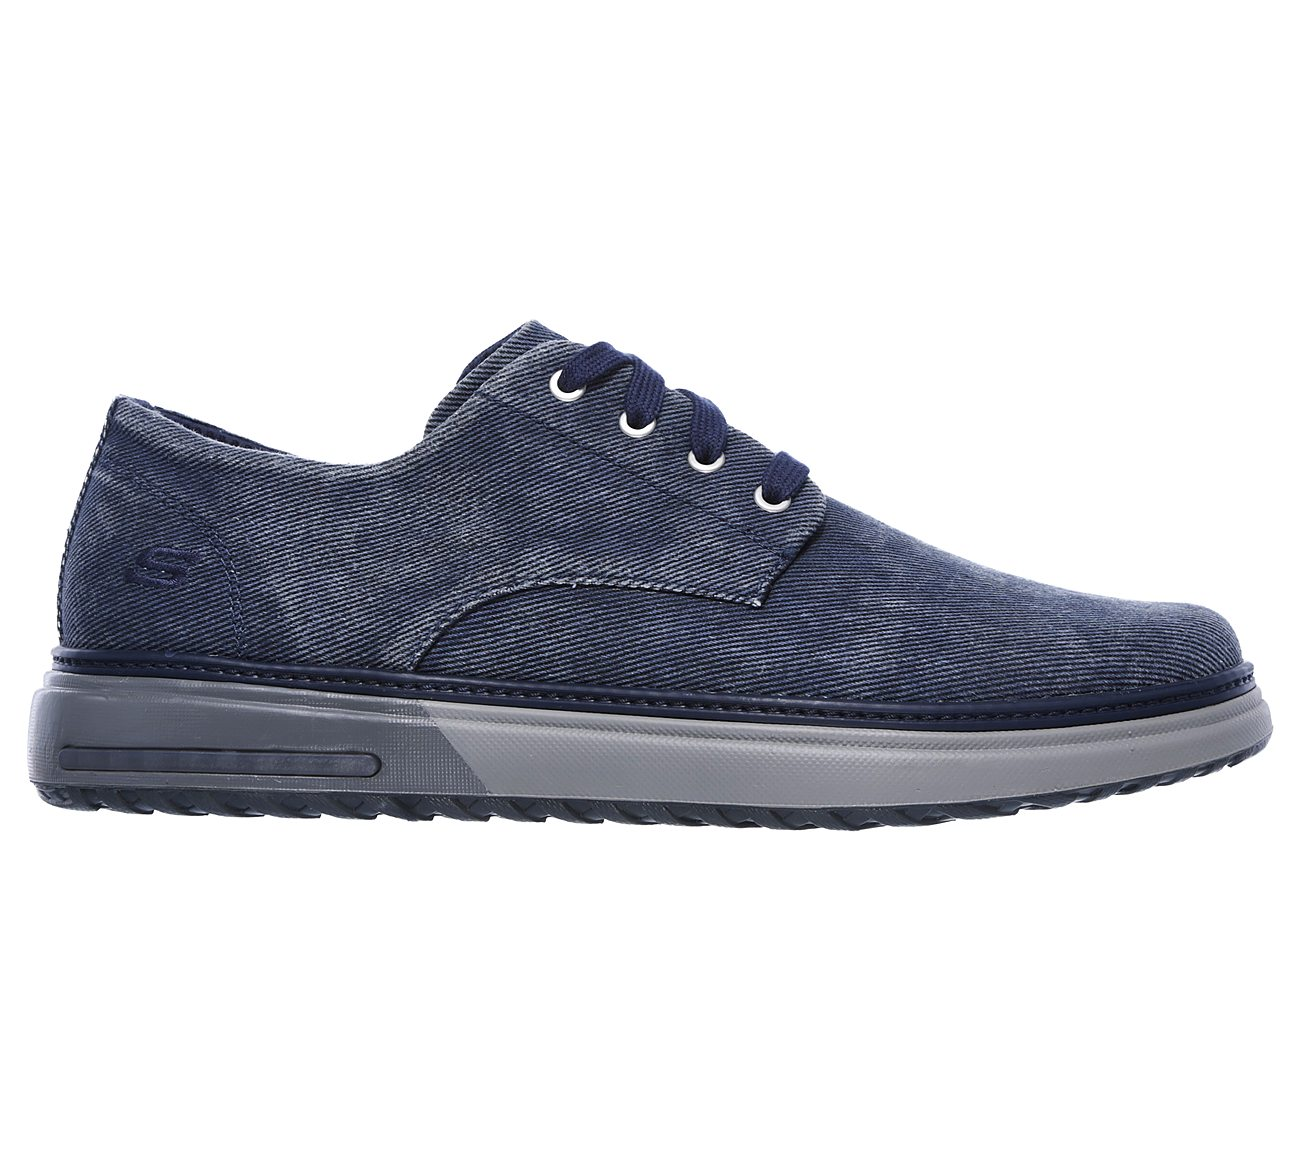 compensación Juntar Comienzo  Buy SKECHERS Folten - Brisor SKECHERS USA Shoes